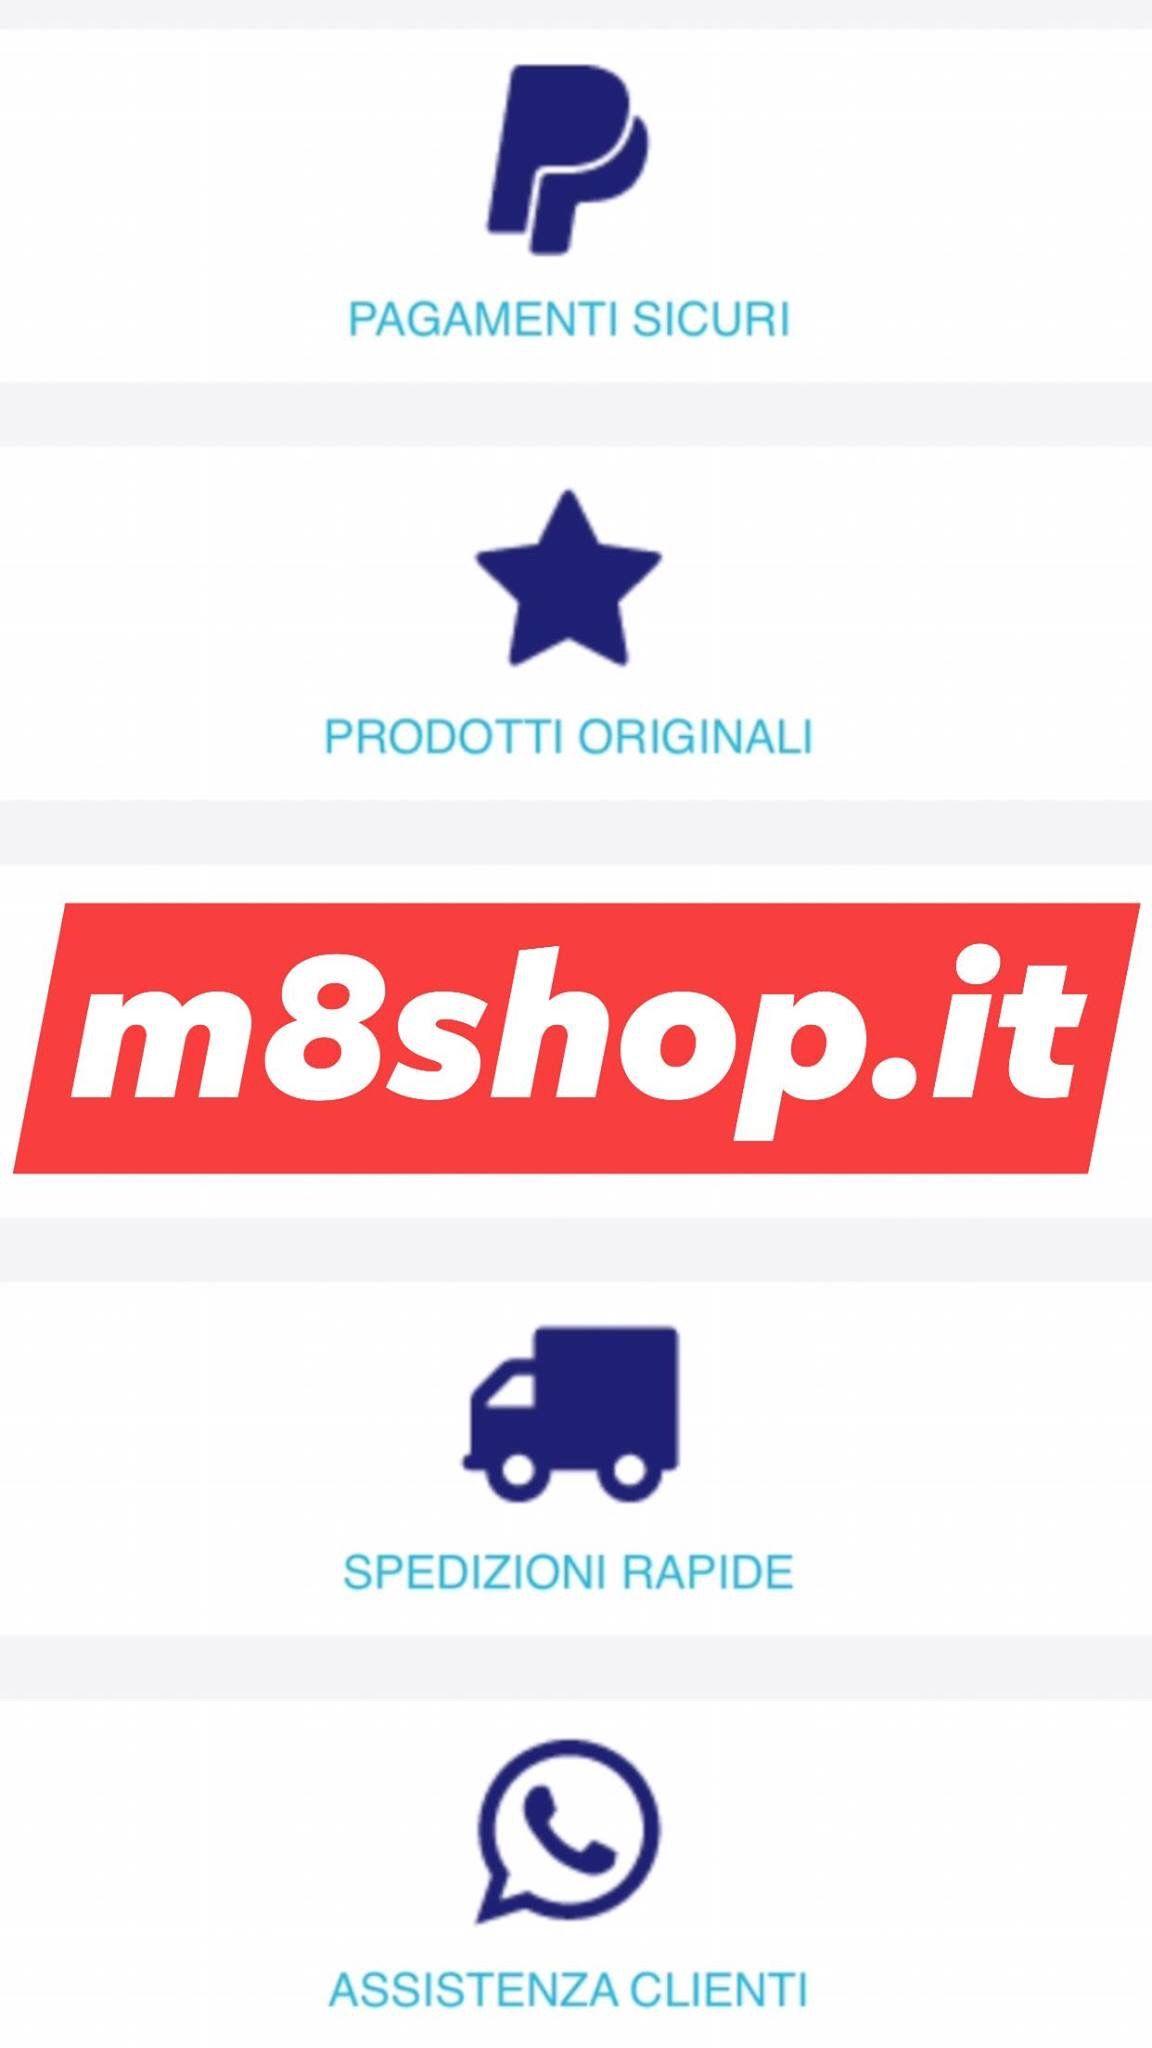 Info m8shop.it | Assistenza clienti